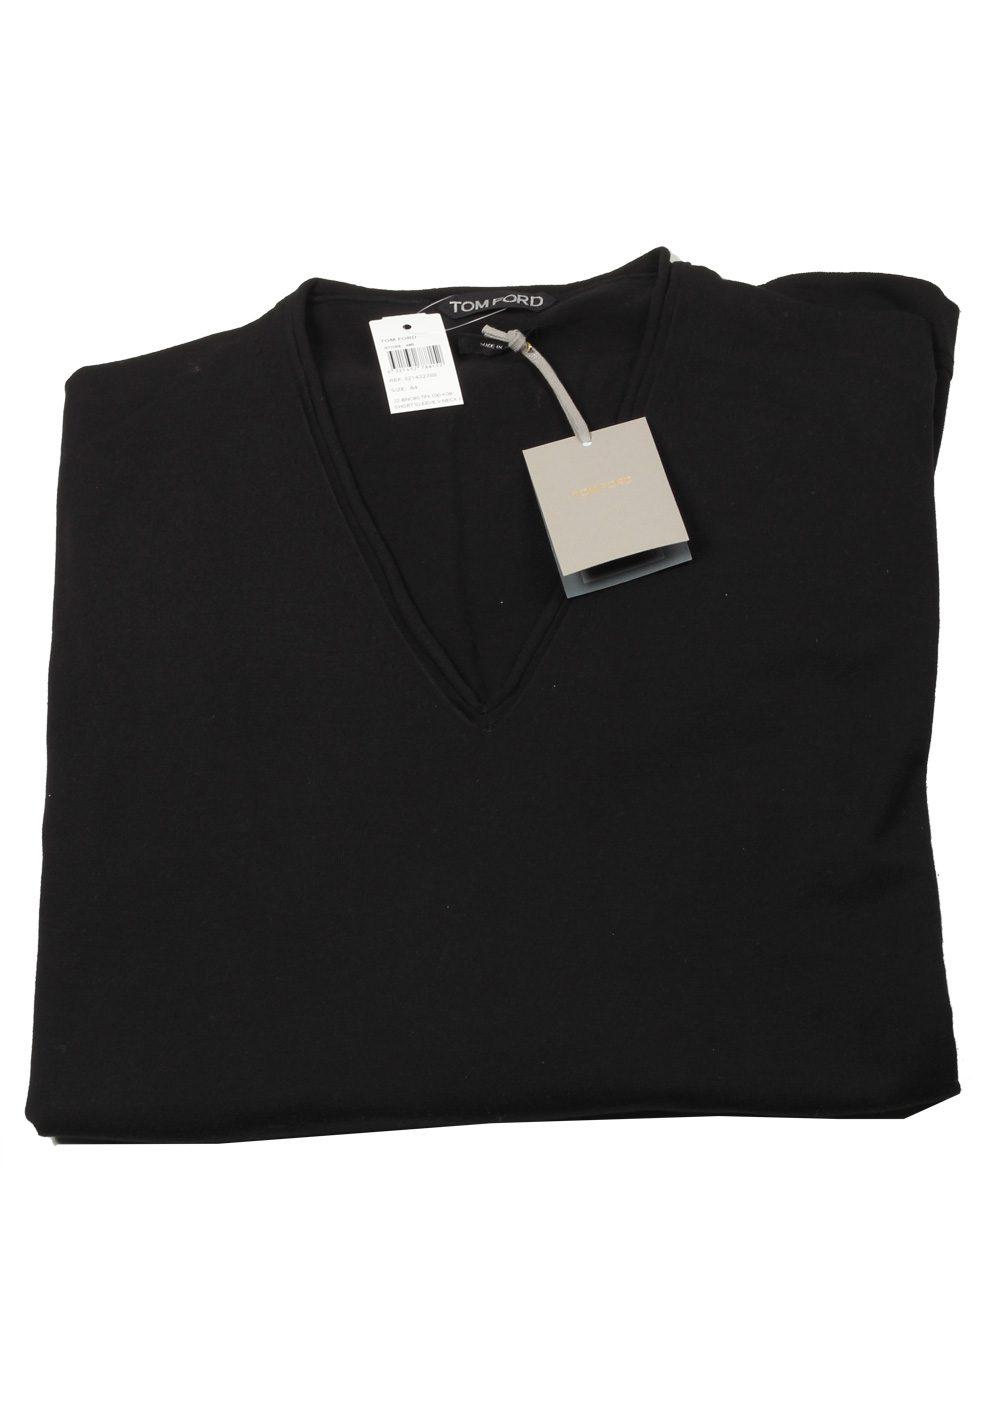 TOM FORD Black V Neck Sweater Size 64 / 54R U.S. In Cotton | Costume Limité